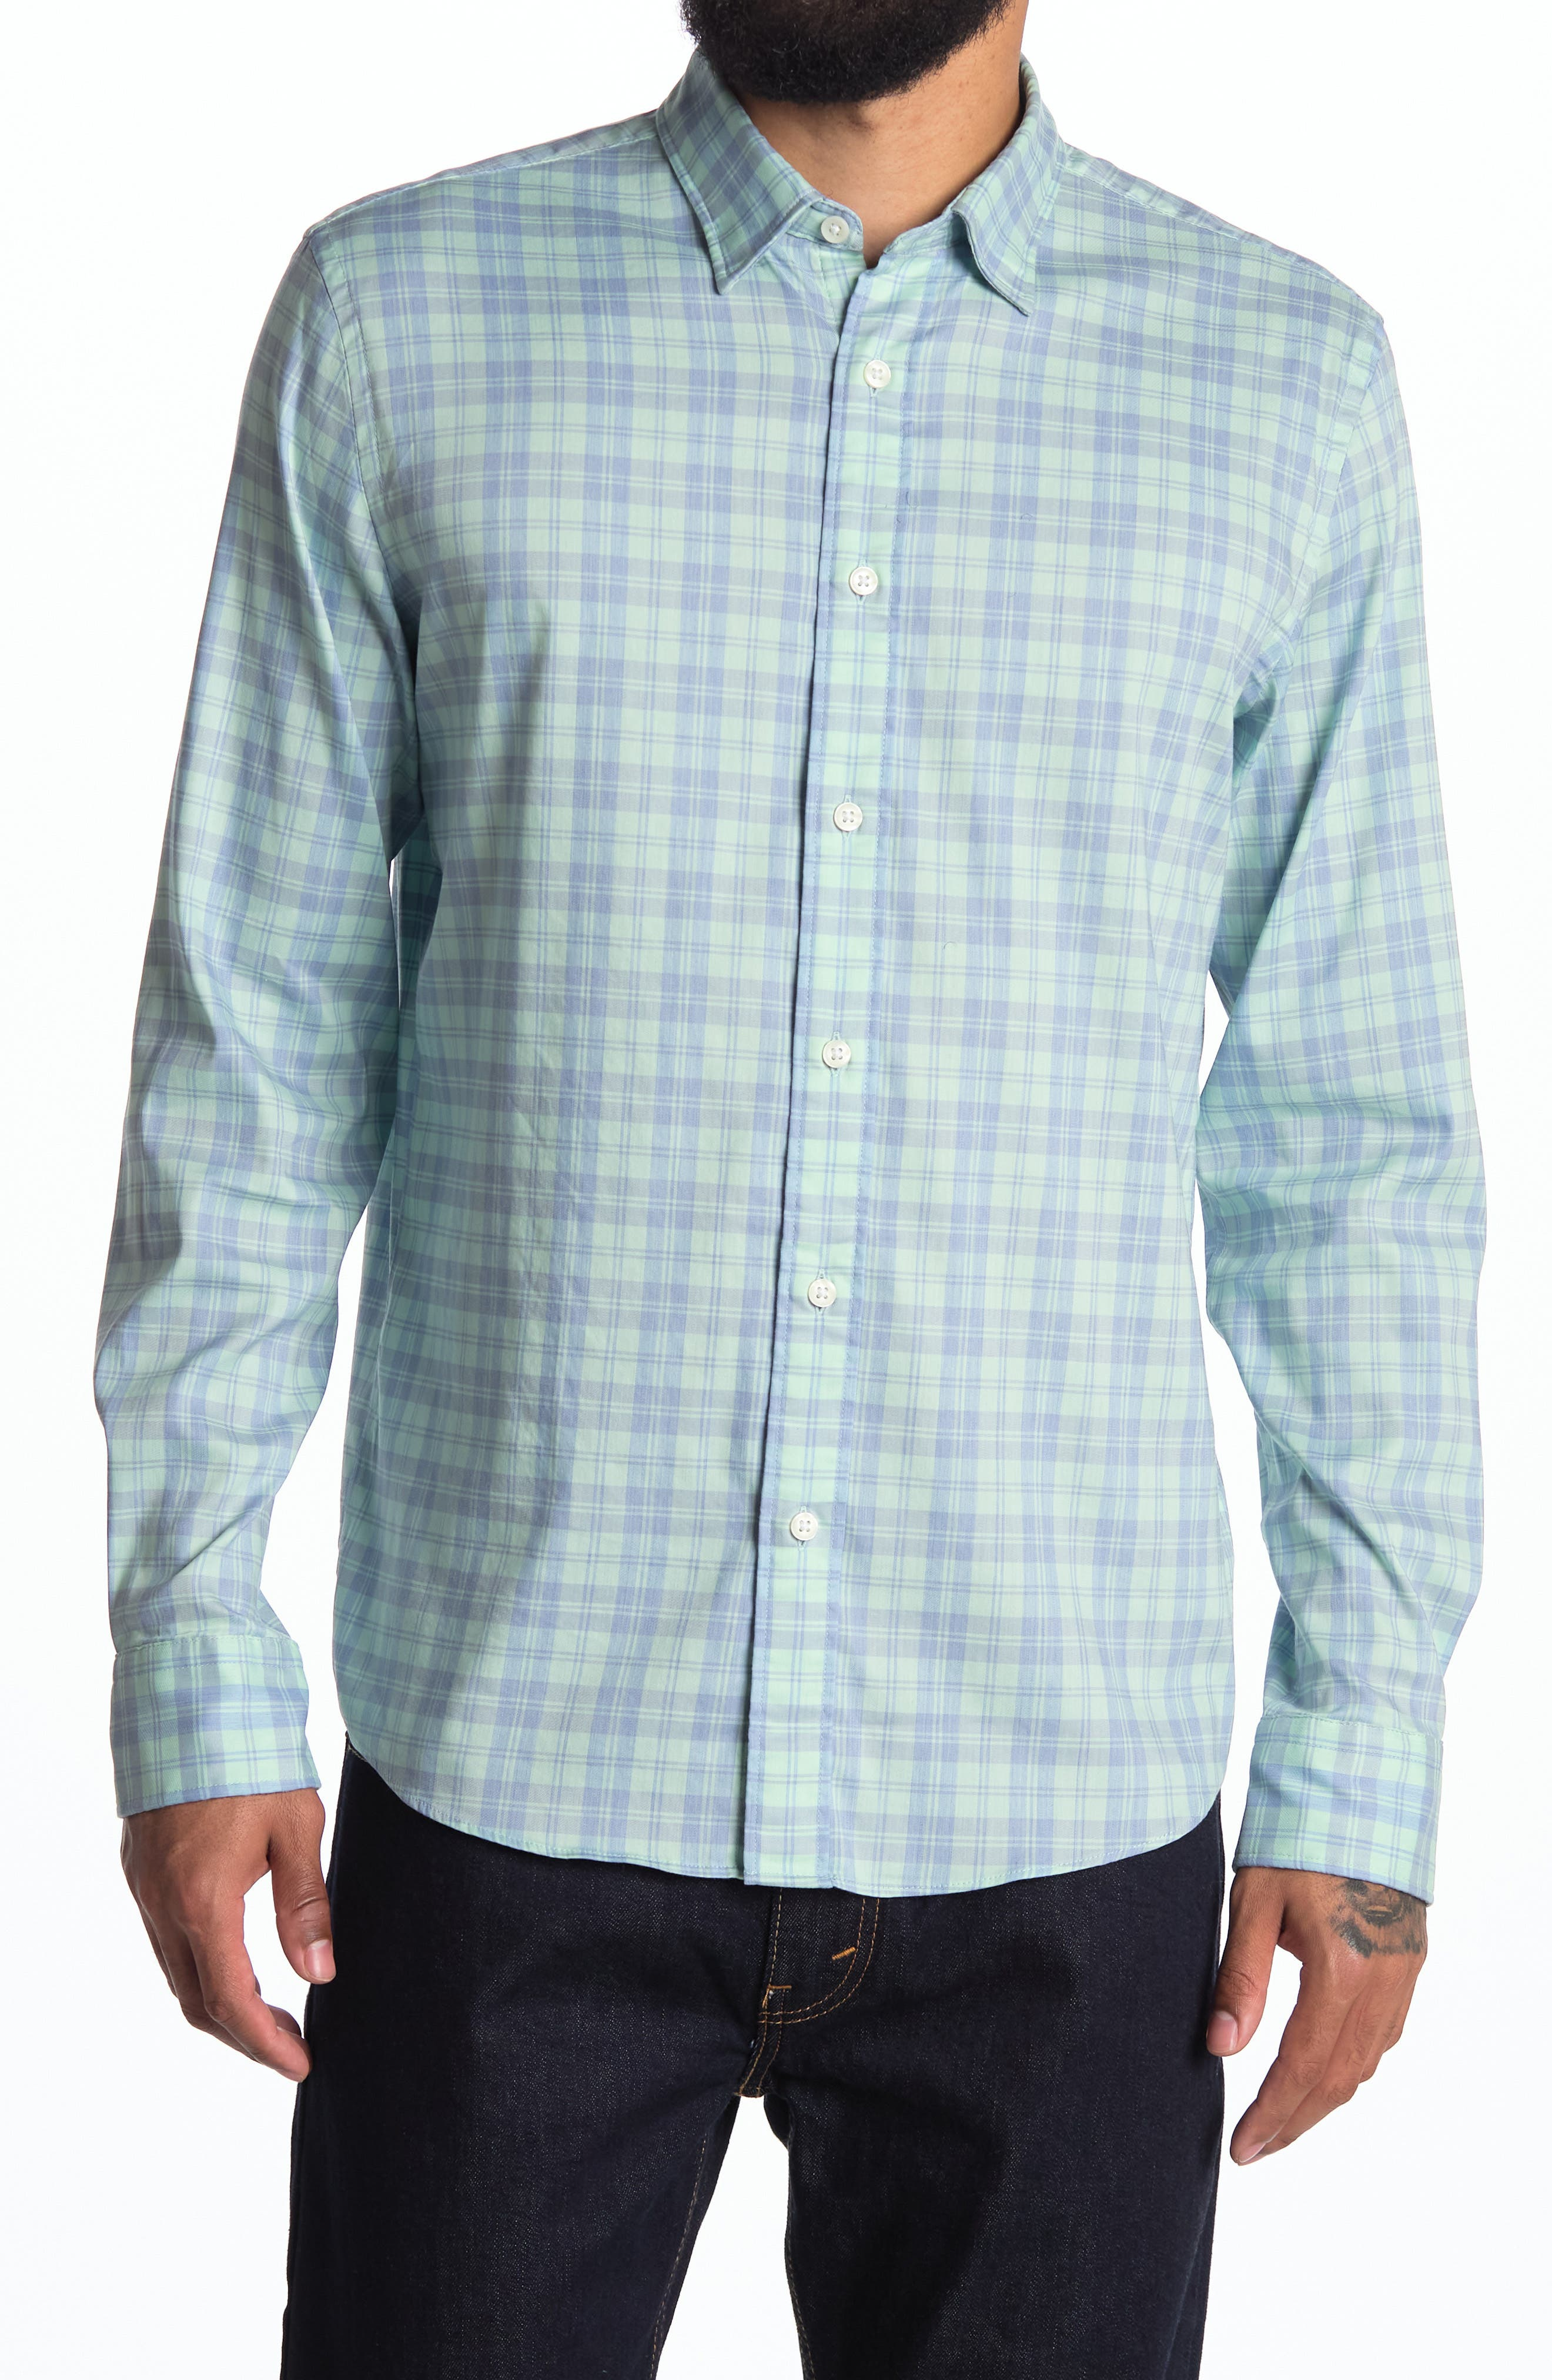 Movement Plaid Button-Up Shirt